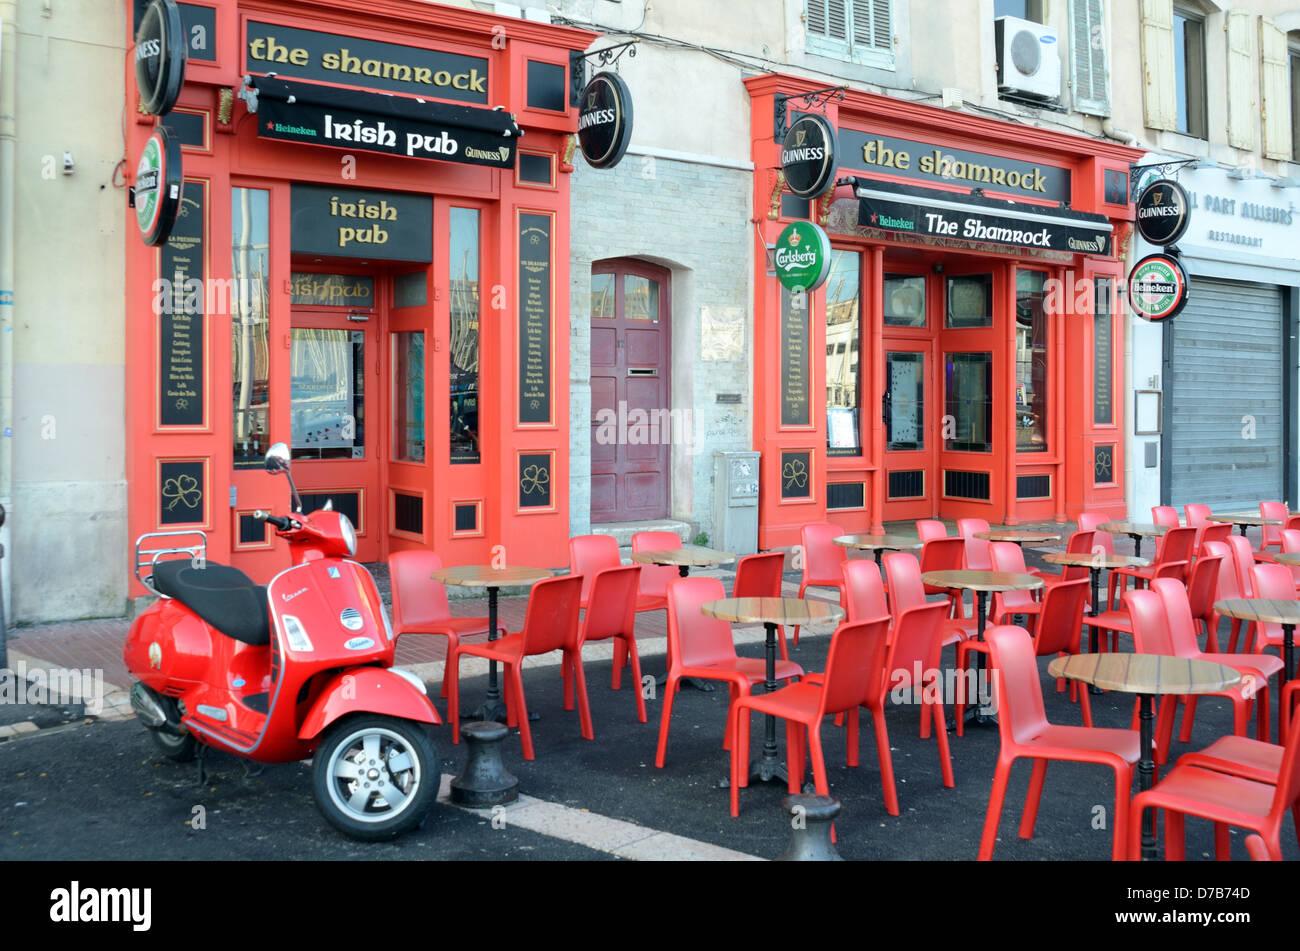 Tavoli E Sedie Heineken.Vuoto Marciapiede Cafe Presso Irish Pub O Bar Rosso Con Tavoli E